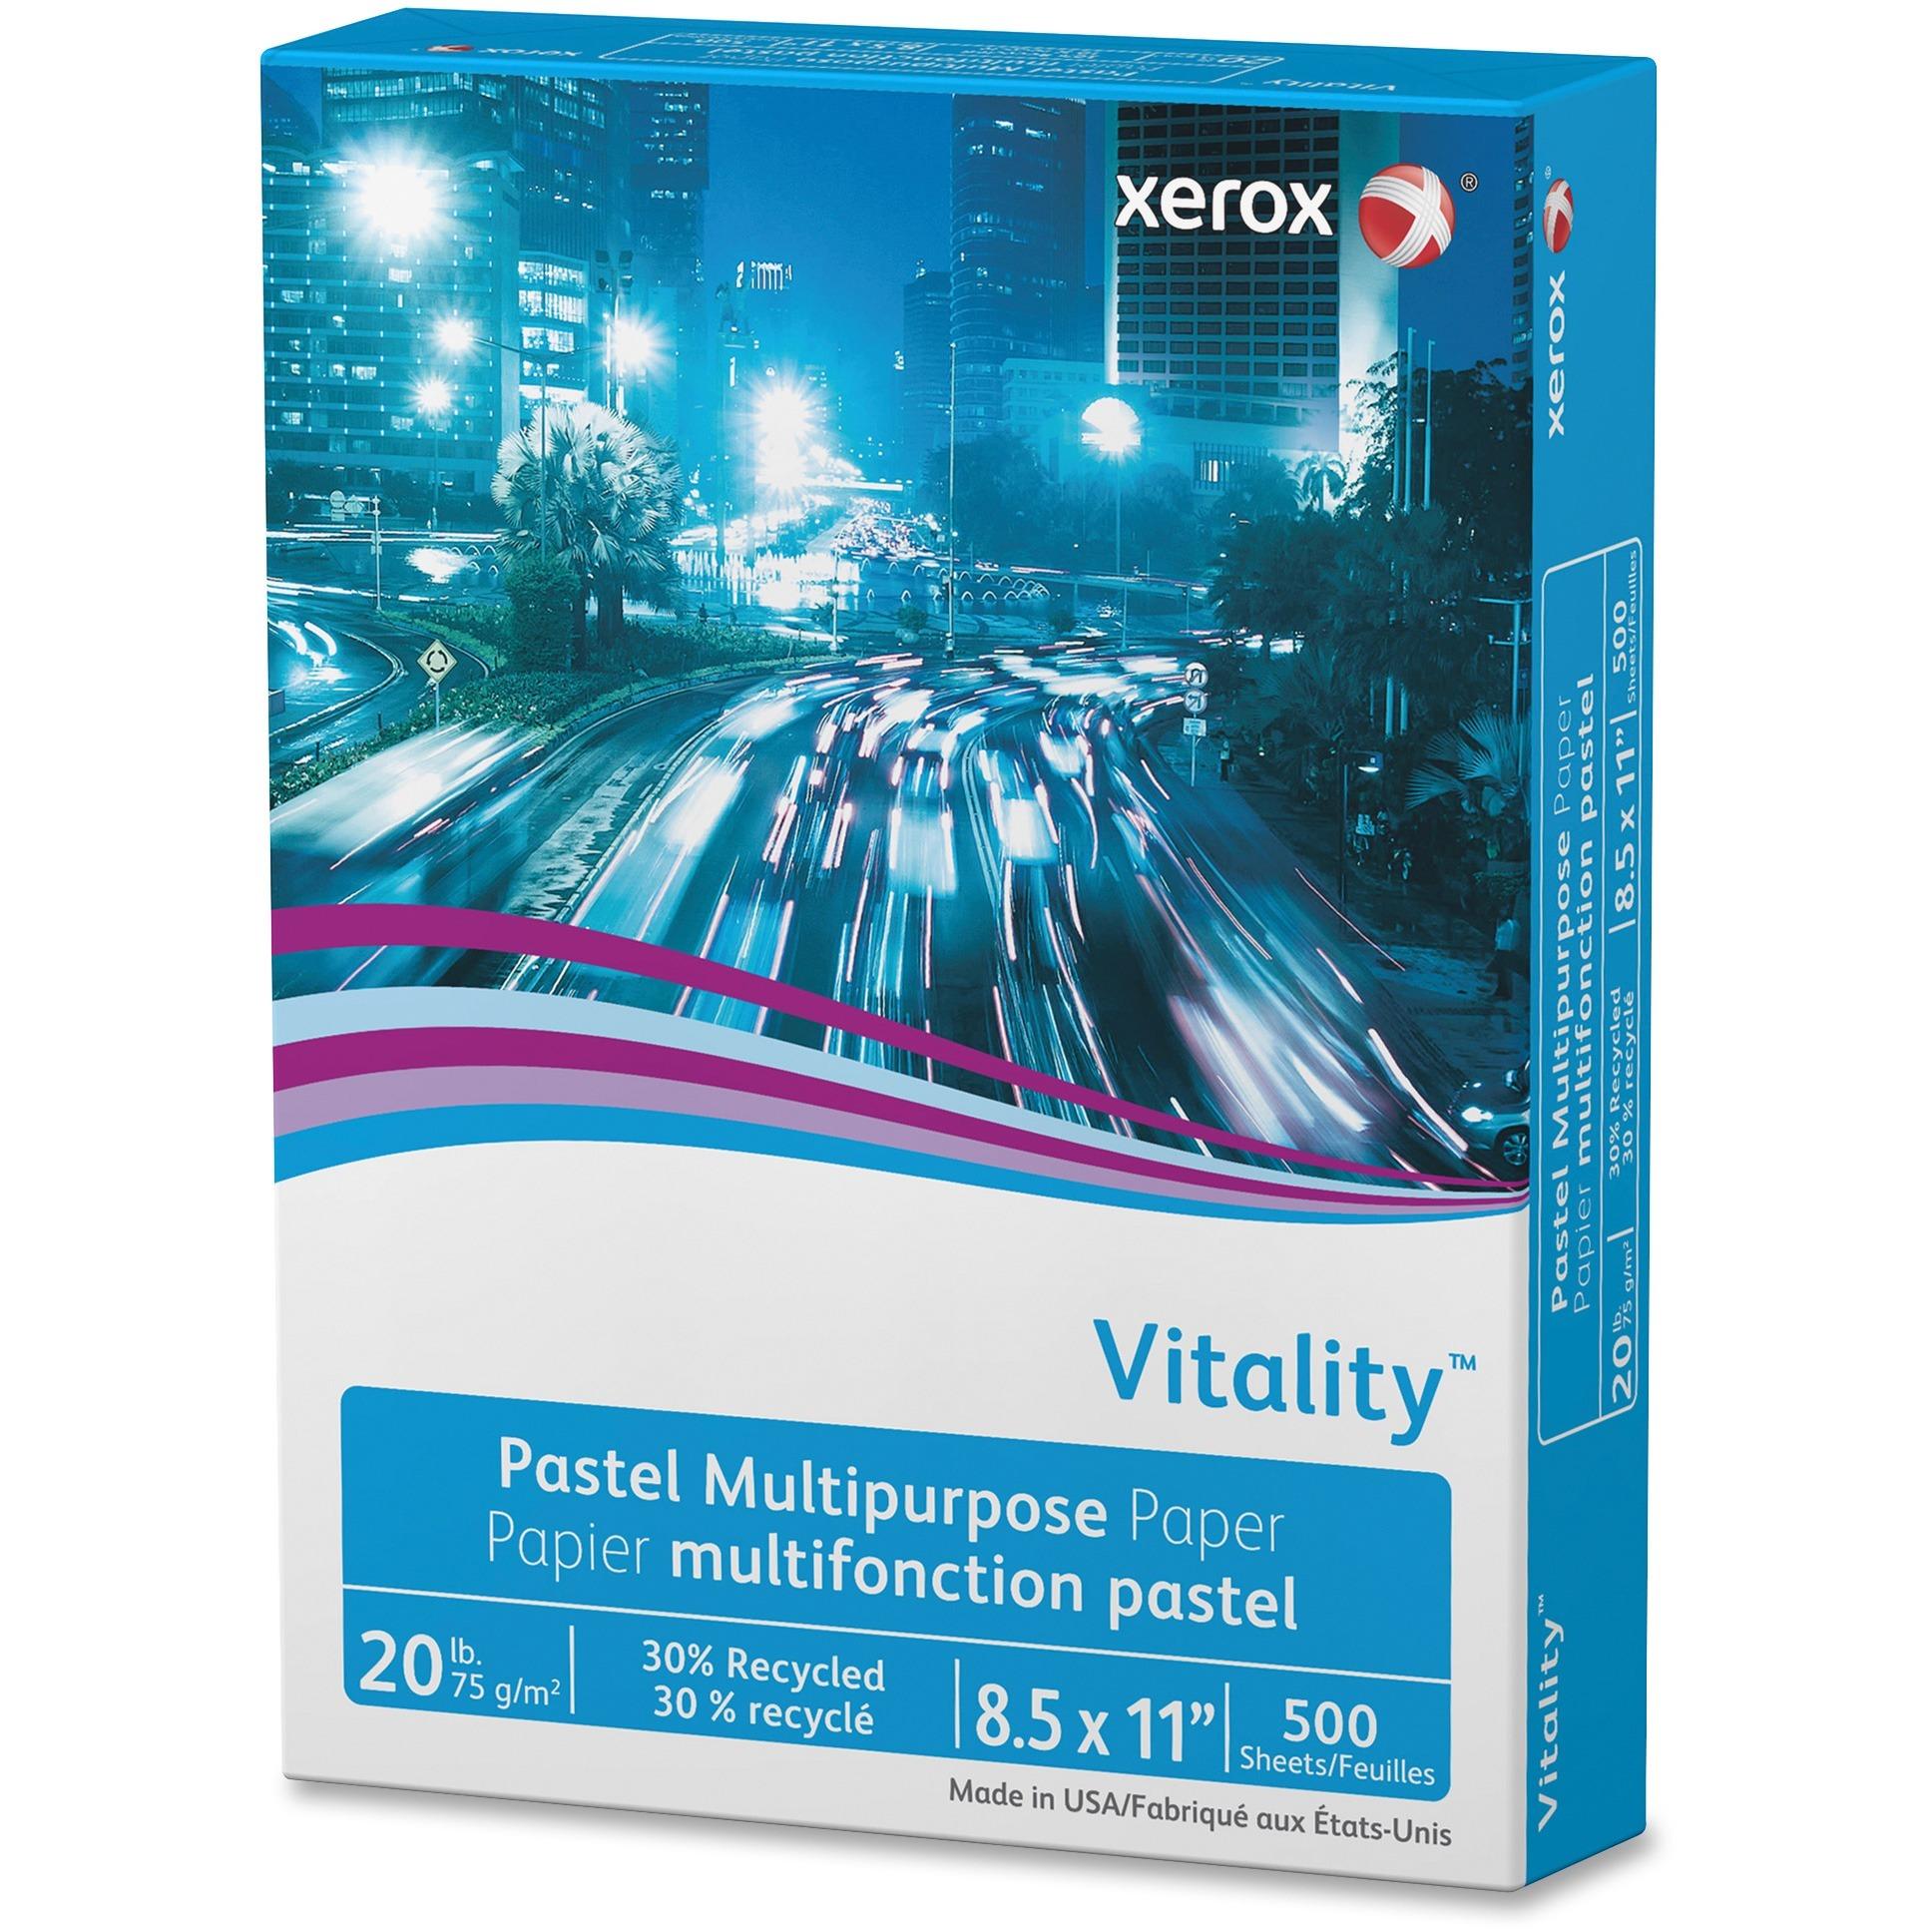 Xerox, XER3R11050, Vitality Multipurpose Pastel Paper, 500 / Ream, Blue